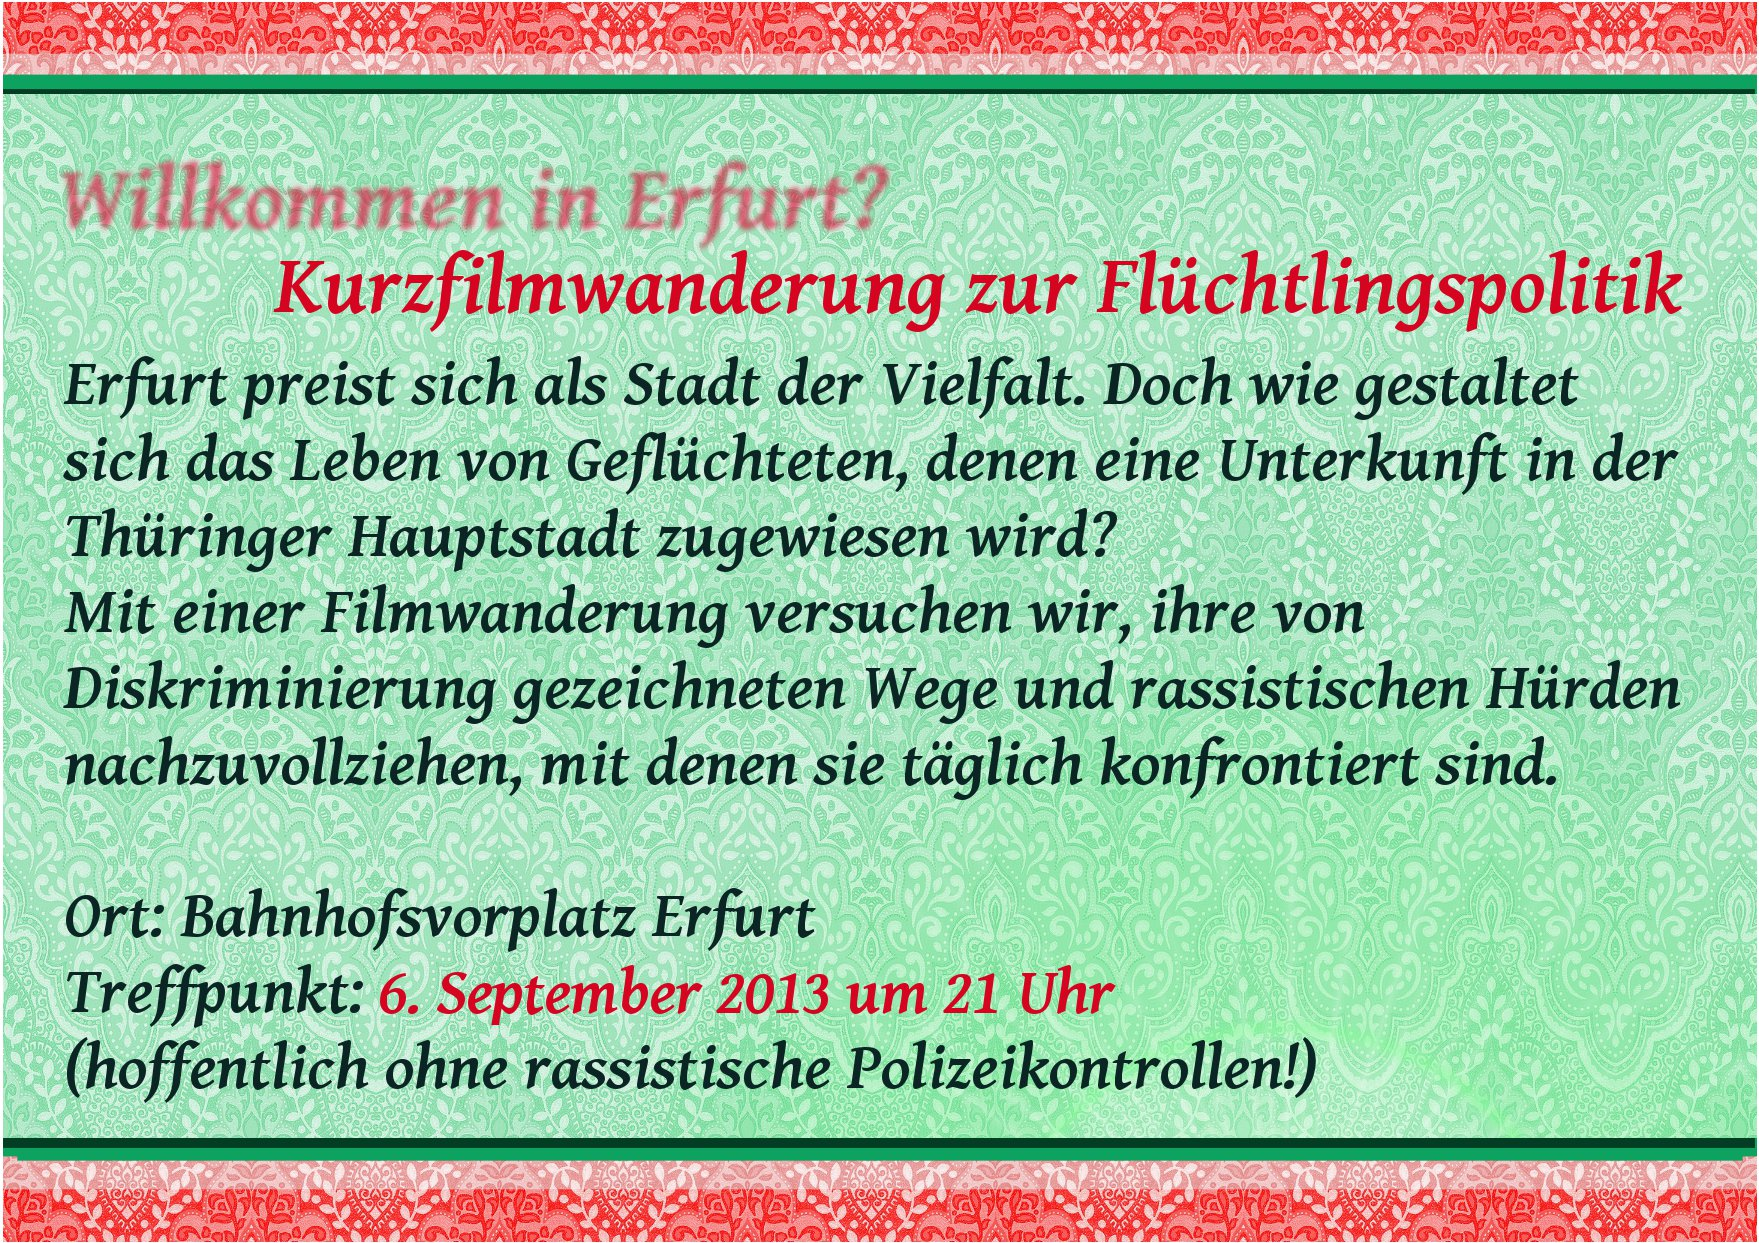 Flyer-Kurzfilmwanderung